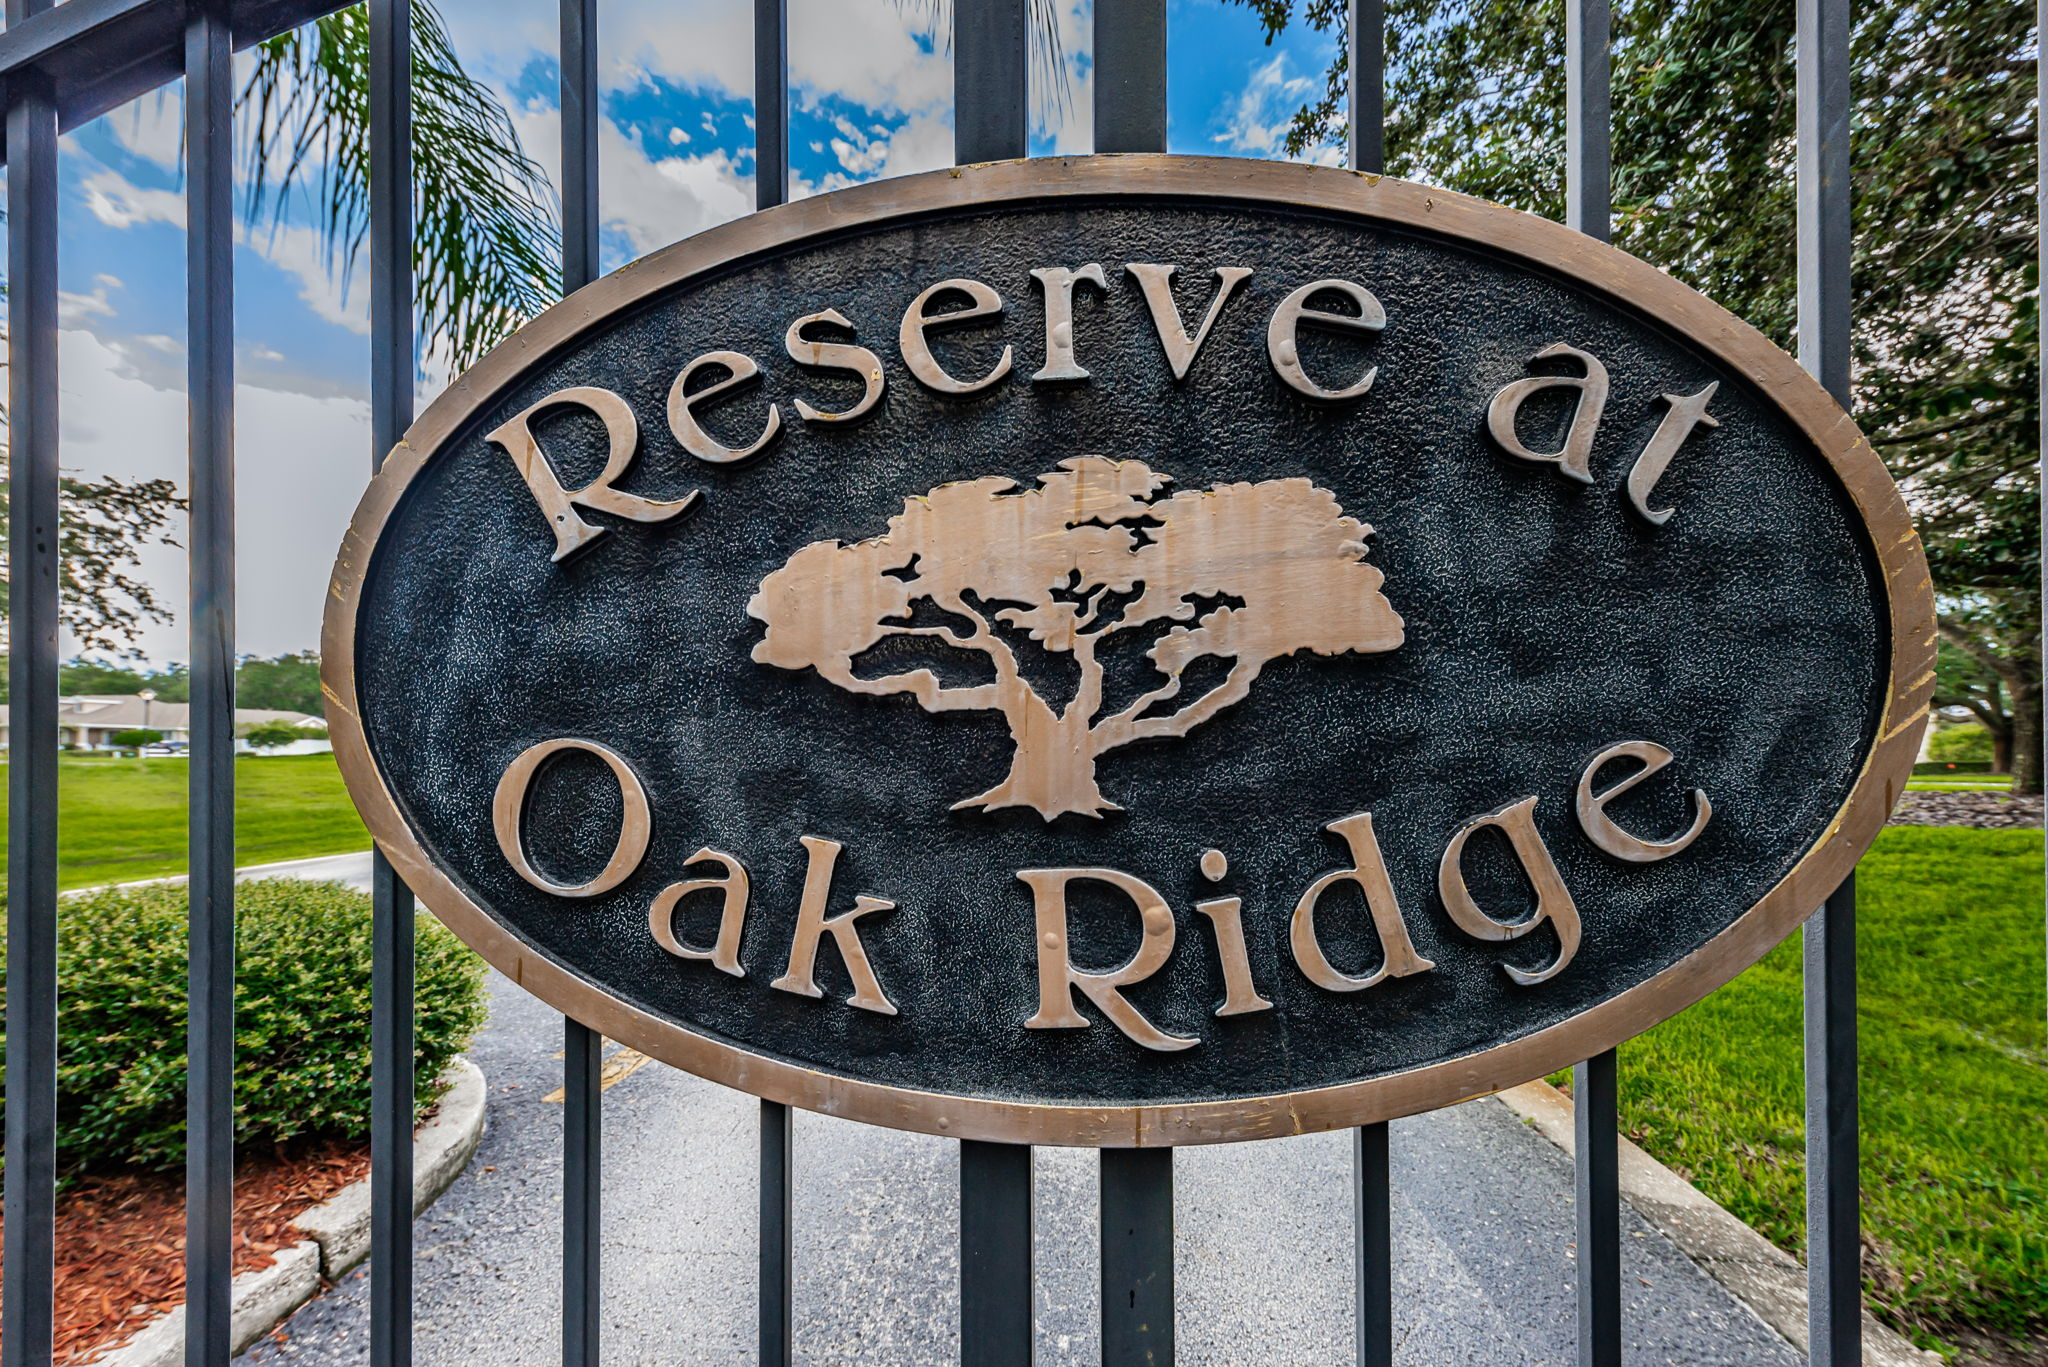 Reserve at Oak Ridge3